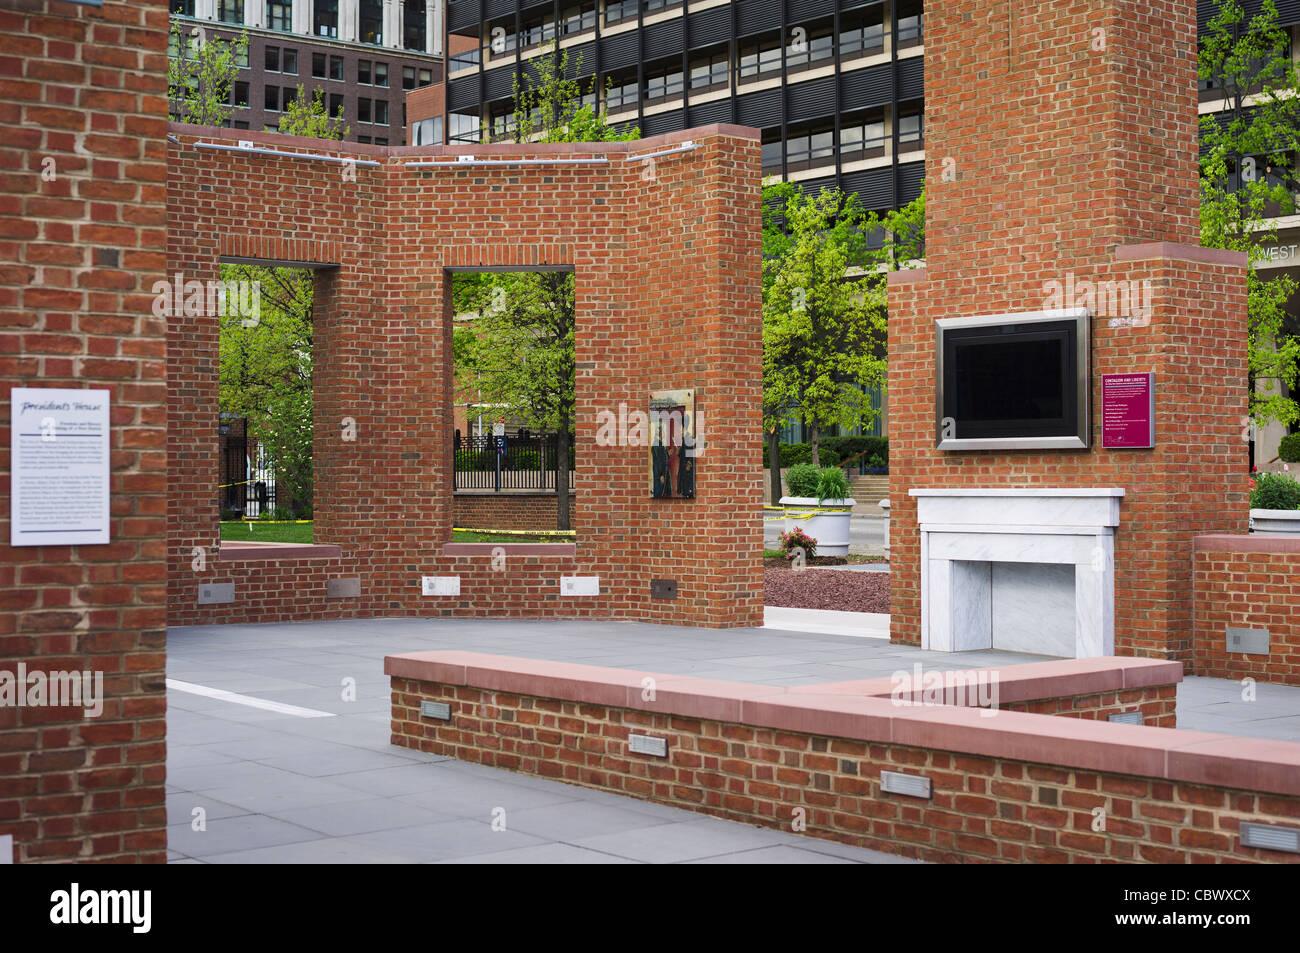 PRESIDENT'S HOUSE SITE PHILADELPHIA PENNSYLVANIA - Stock Image